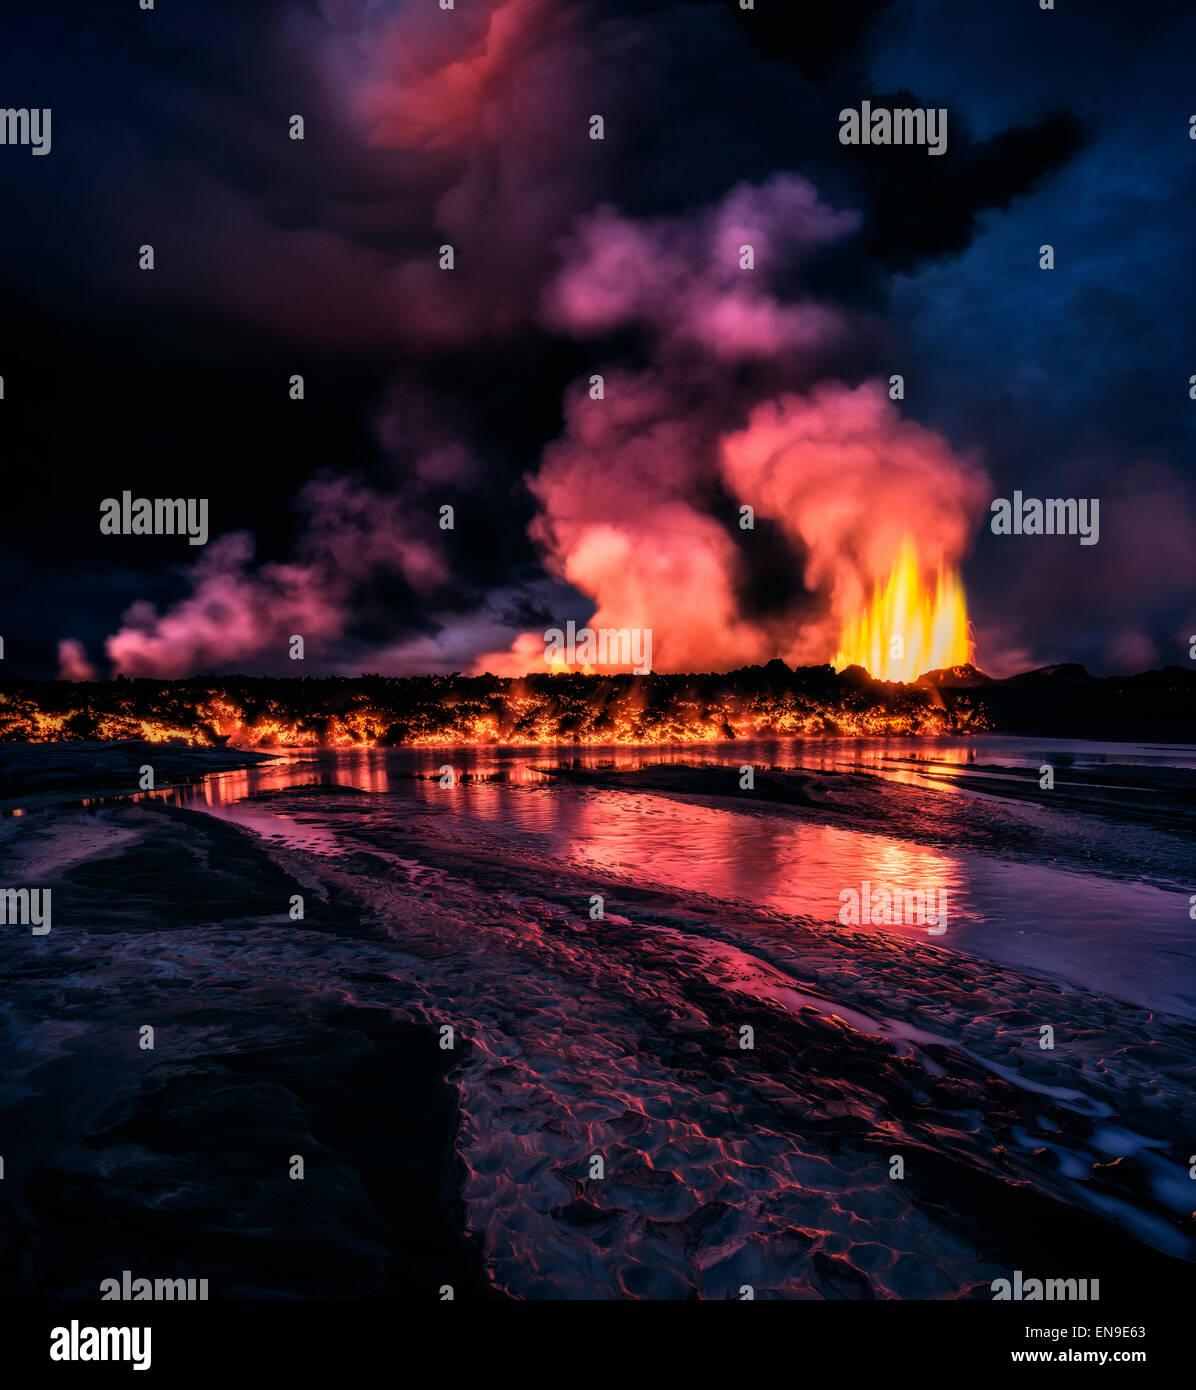 Glühende Lava aus der Eruption des Holuhraun Riss, in der Nähe der Vulkan Bardarbunga, Island. Stockbild